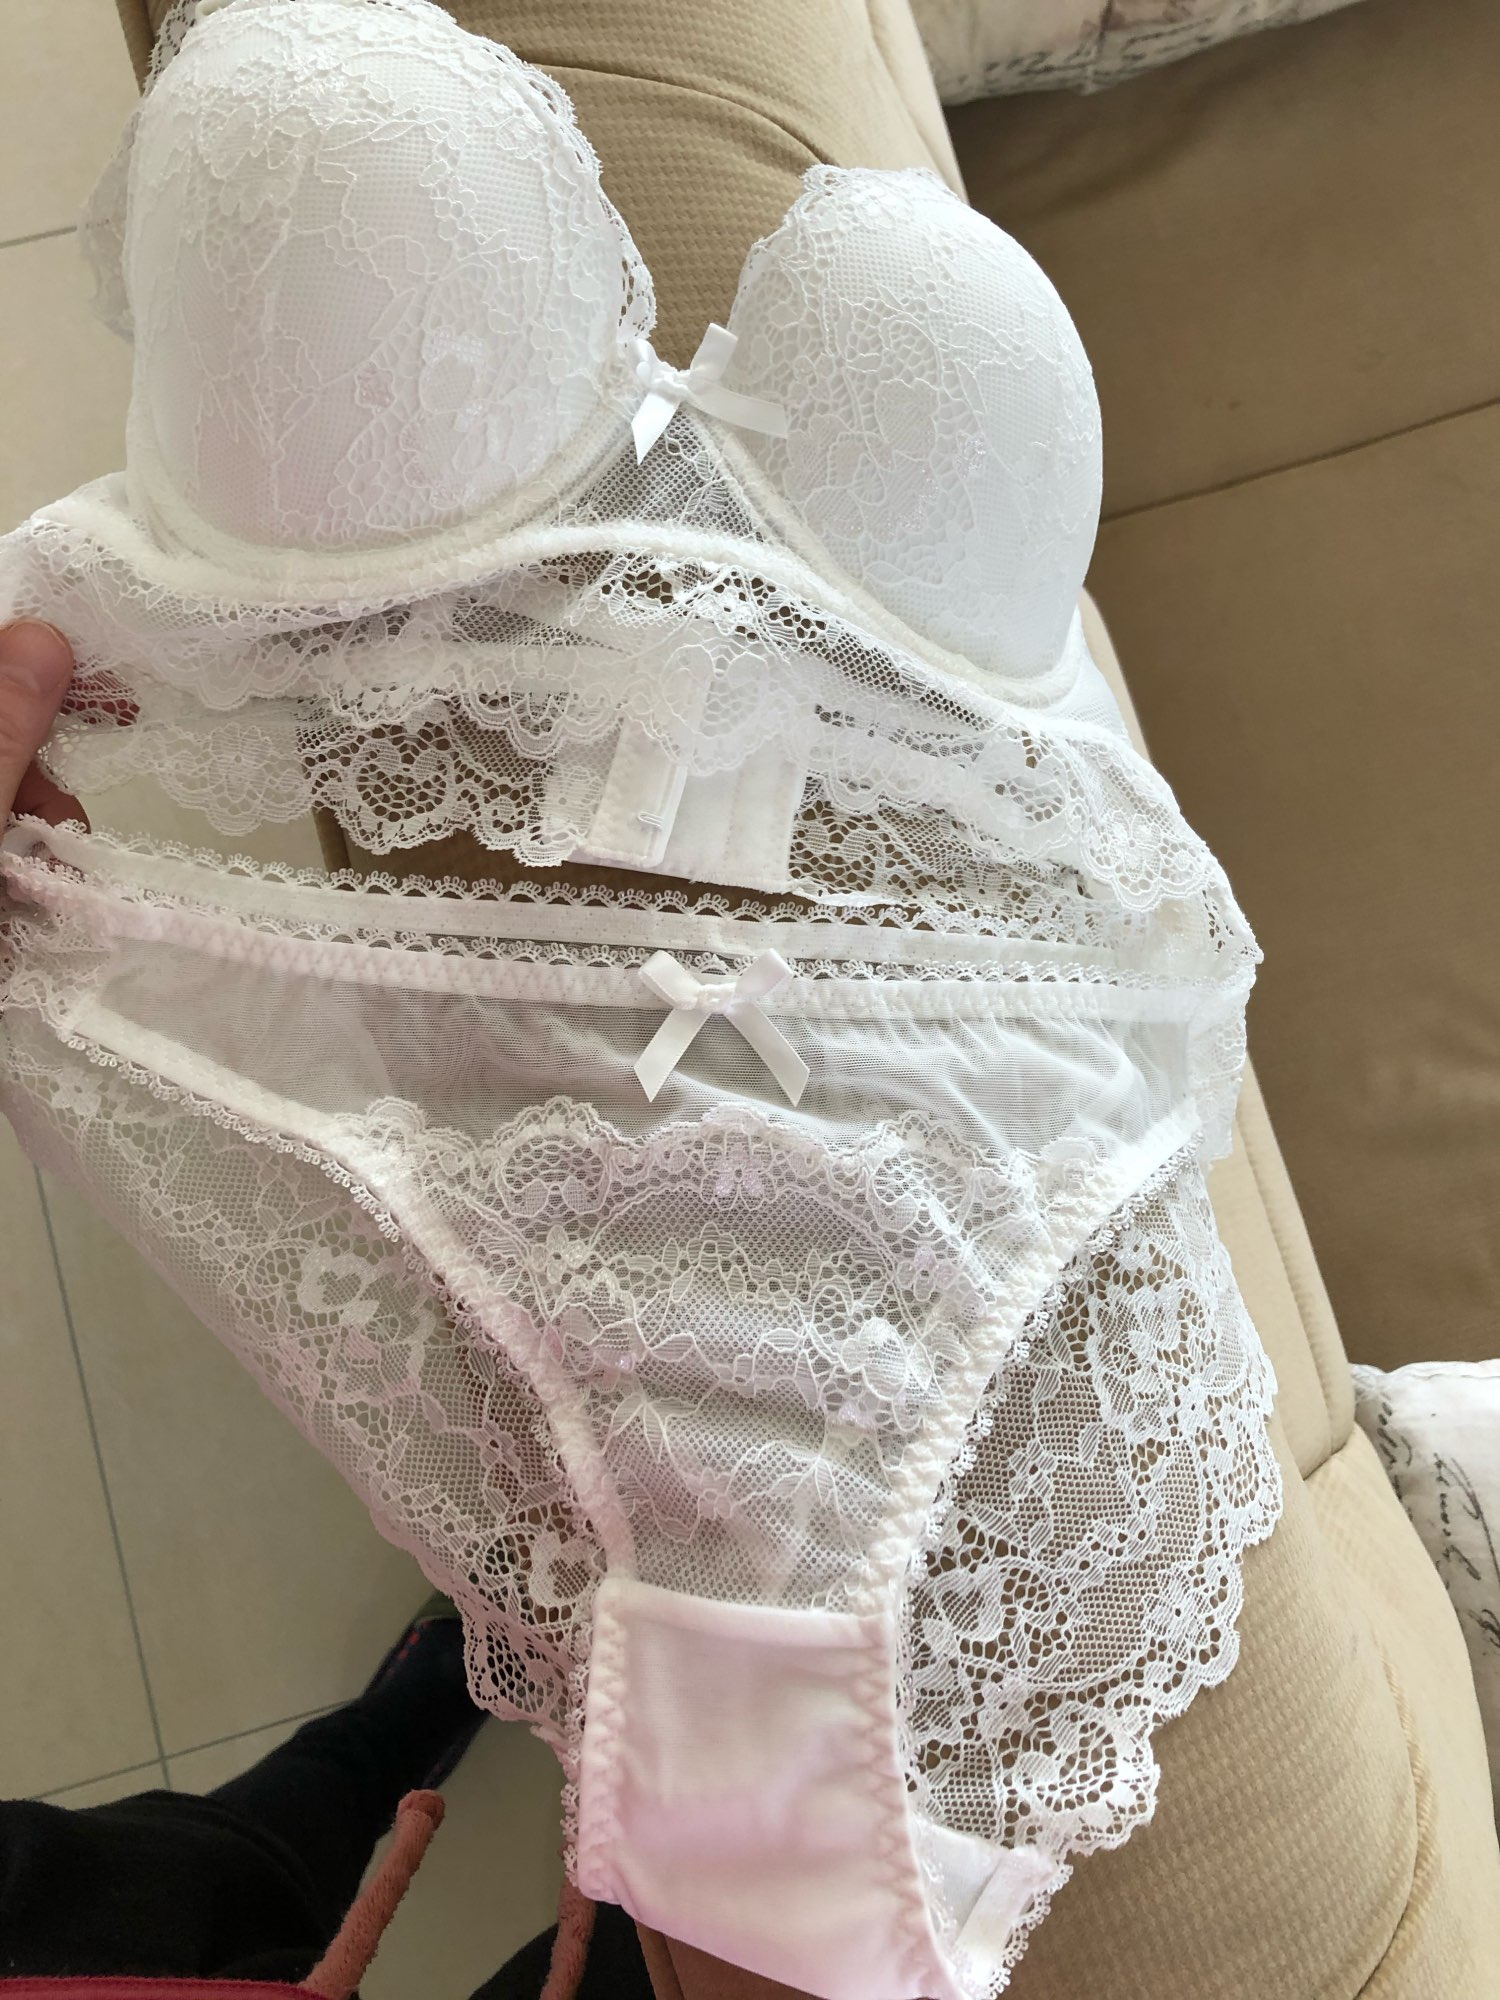 Free shipping Fashion autumn and winter underwear female sexy lace adjustable bra set thin plus size push up bra set|push bra set|push up bra setbra set - AliExpress